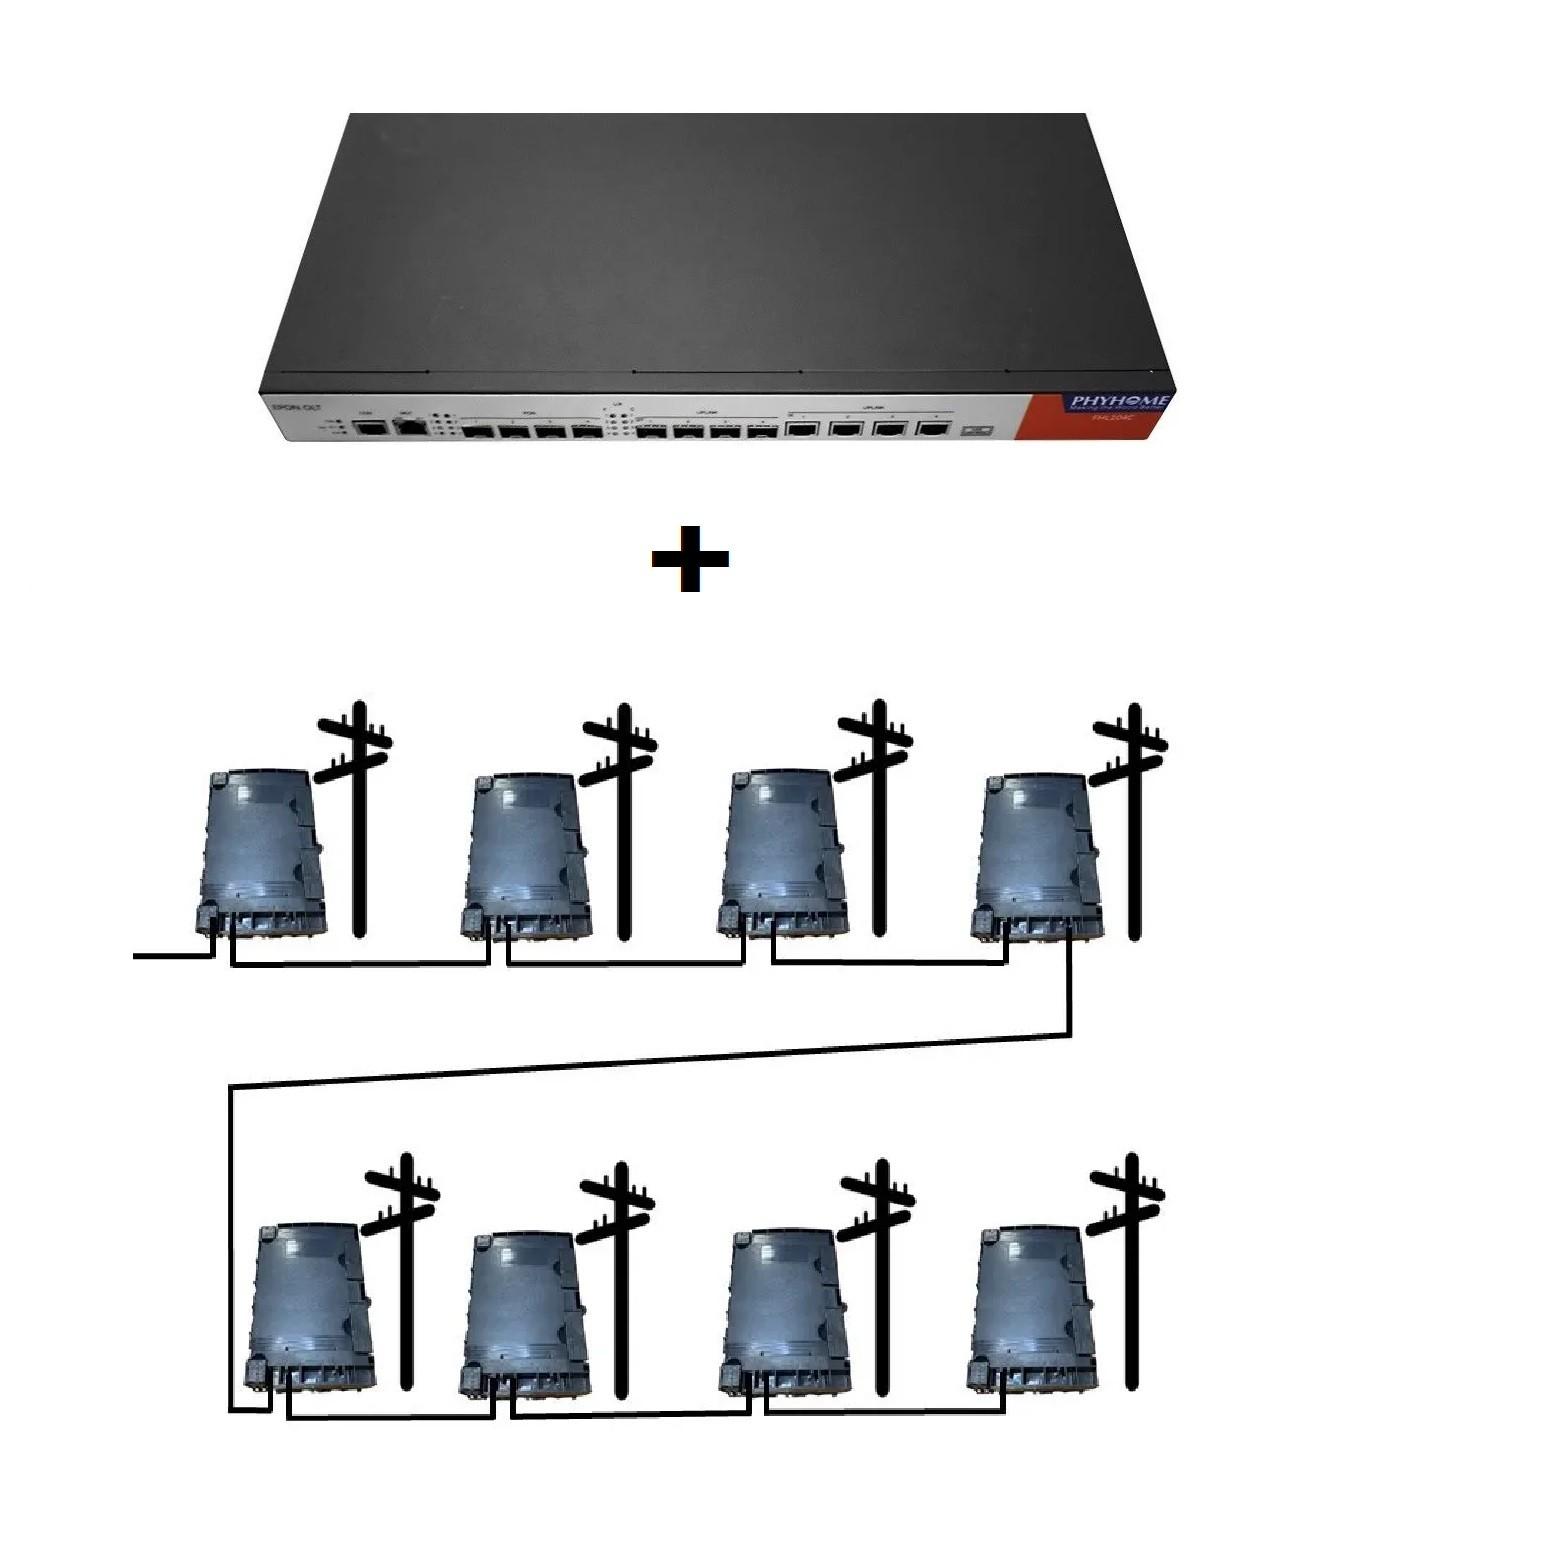 KIT OLT EPON FHL104C PHYHOME + Projeto Turn Key FTTH 8:1:8 - 64 Portas   - ComputechLoja